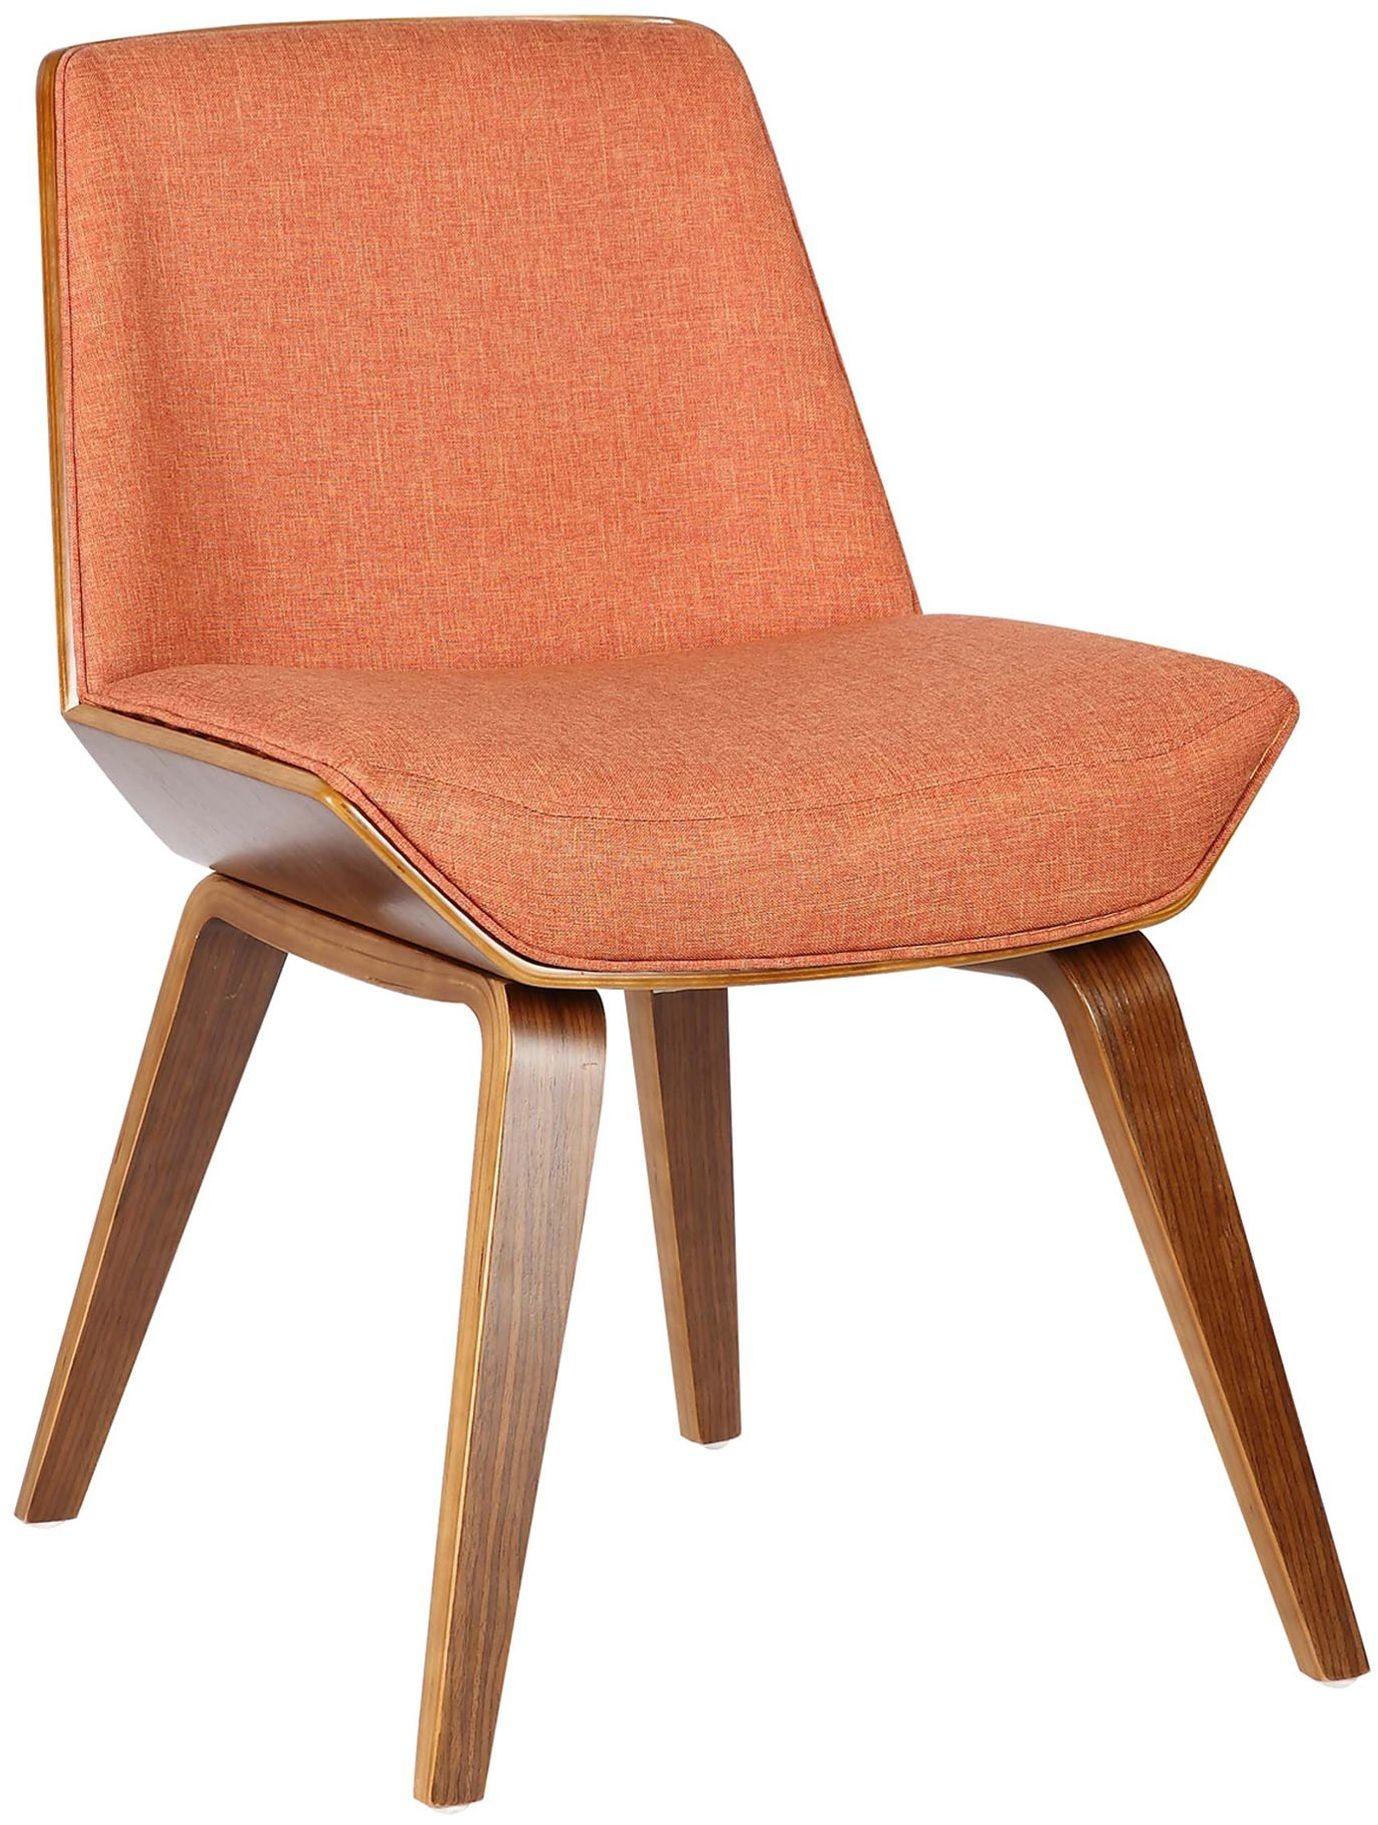 Agi MidCentury Orange Dining Chair Set of 2 from Armen